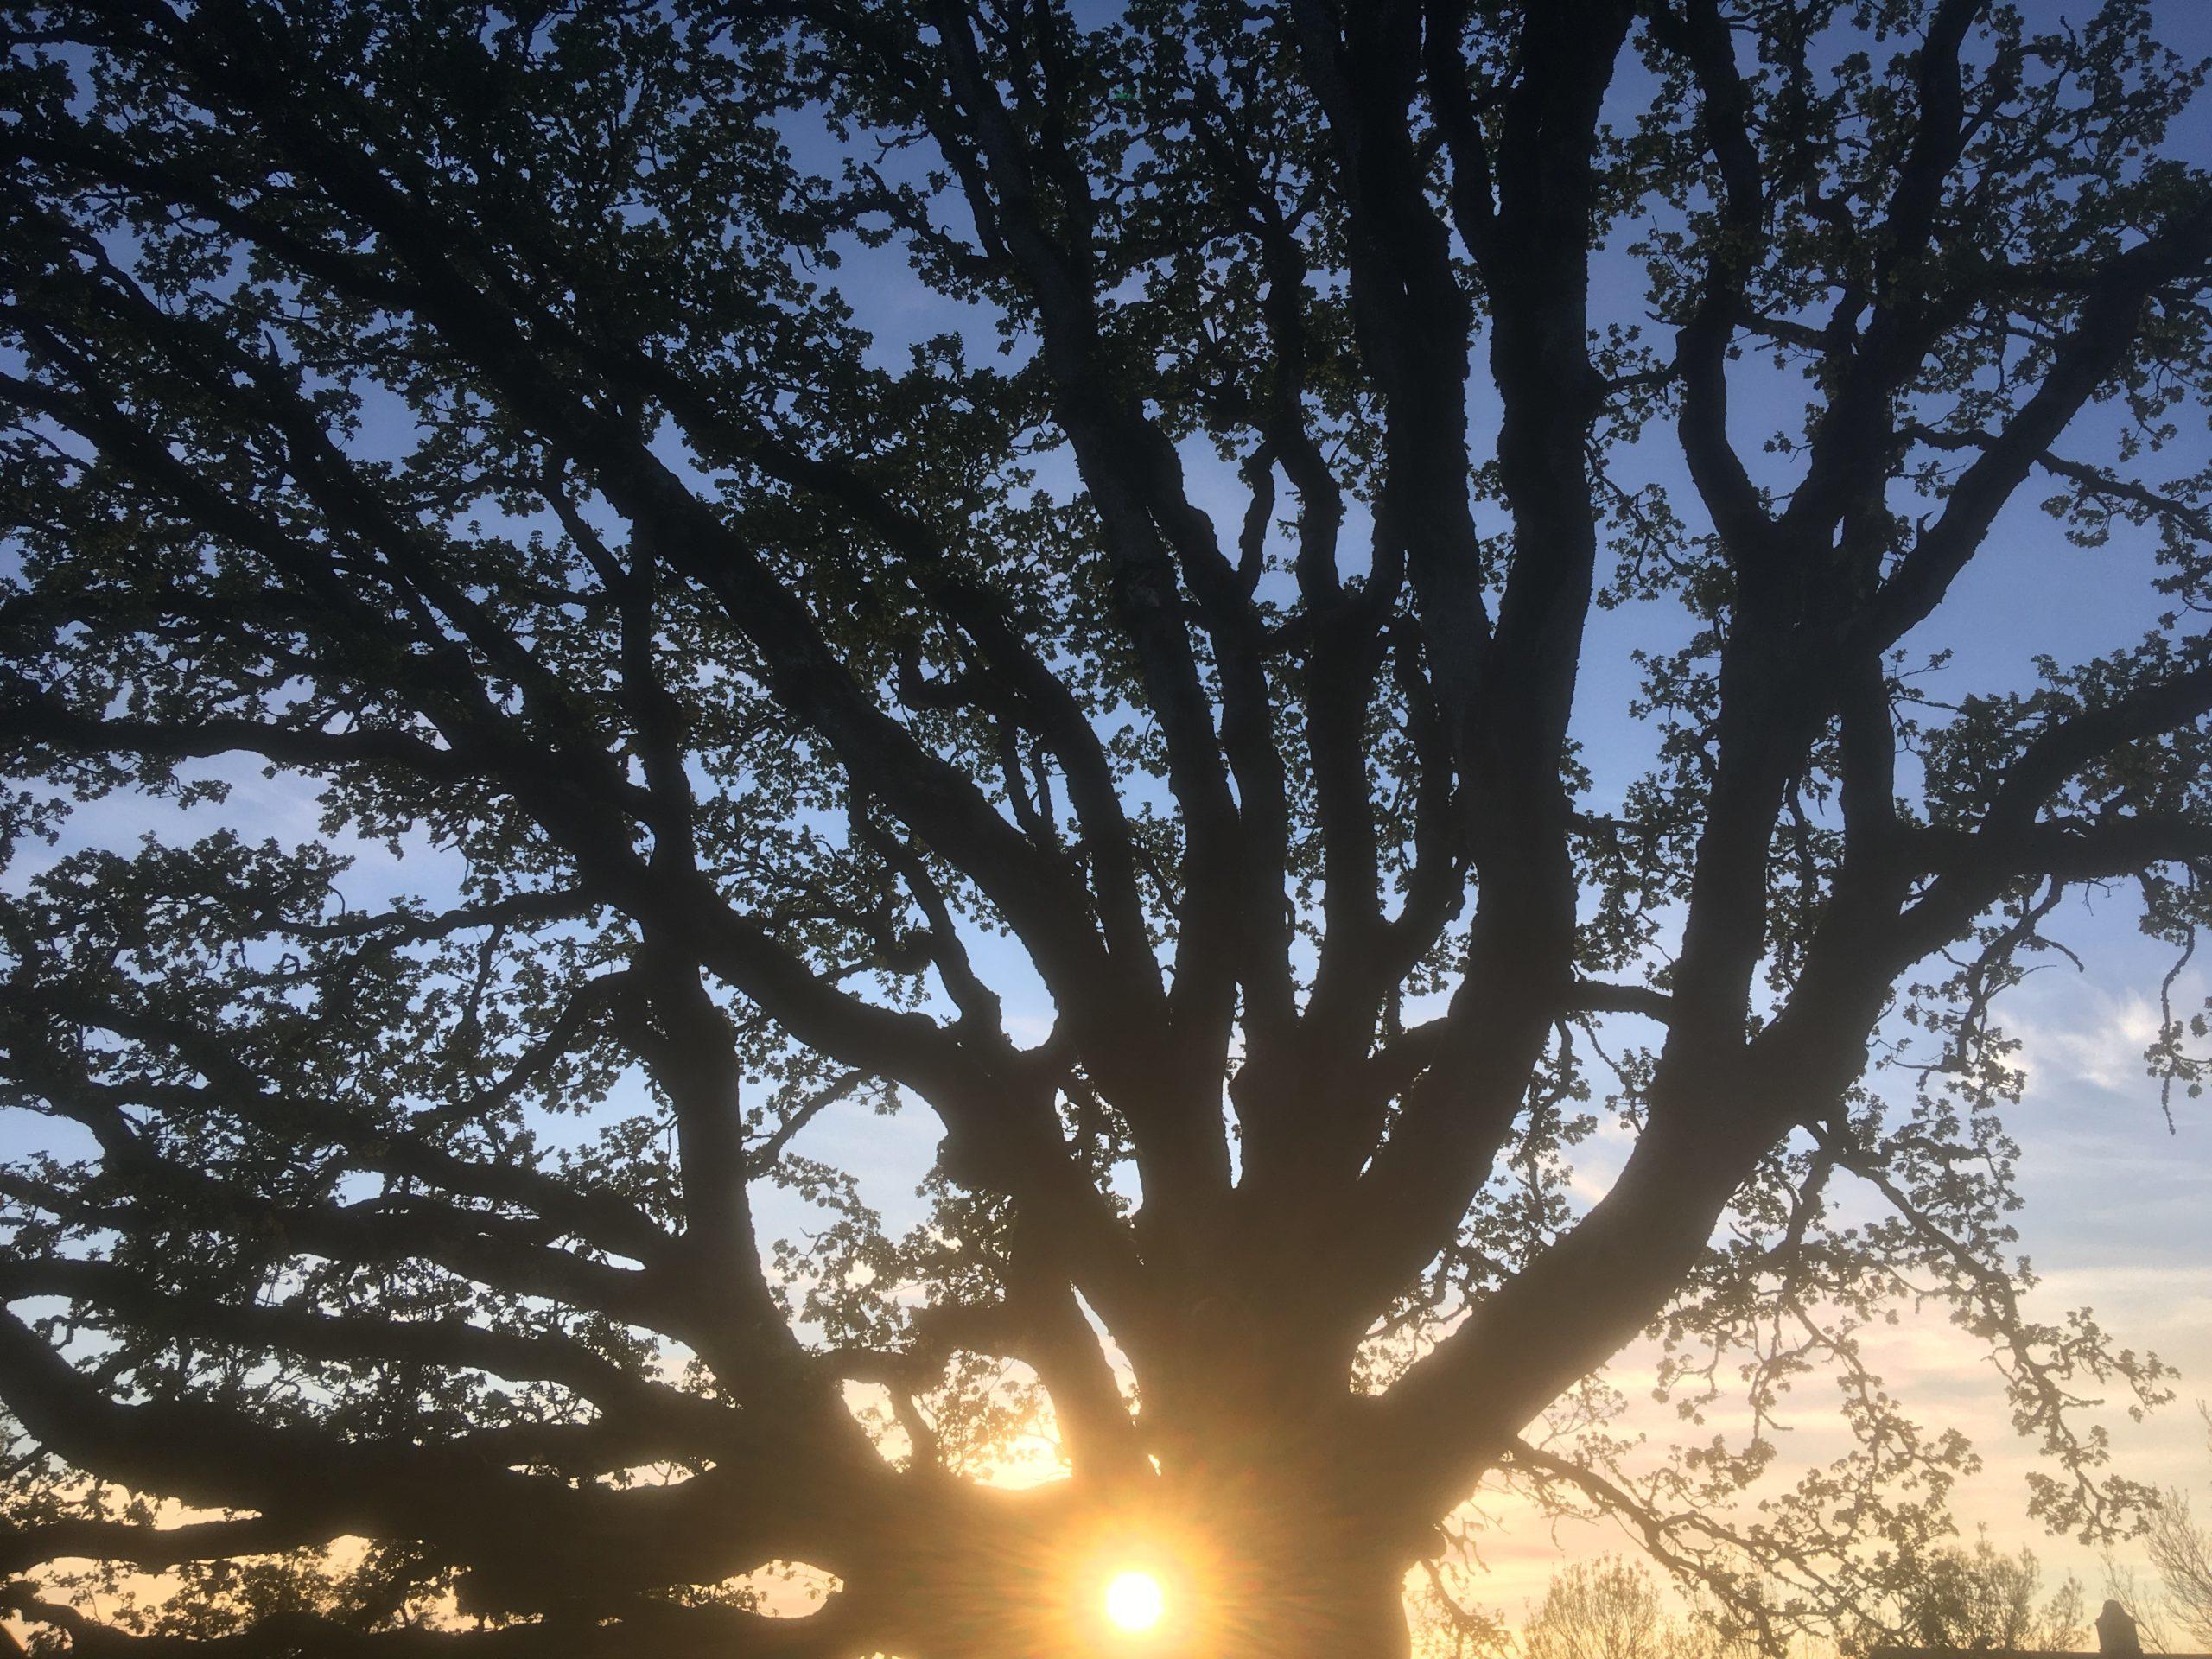 oak tree and setting sun